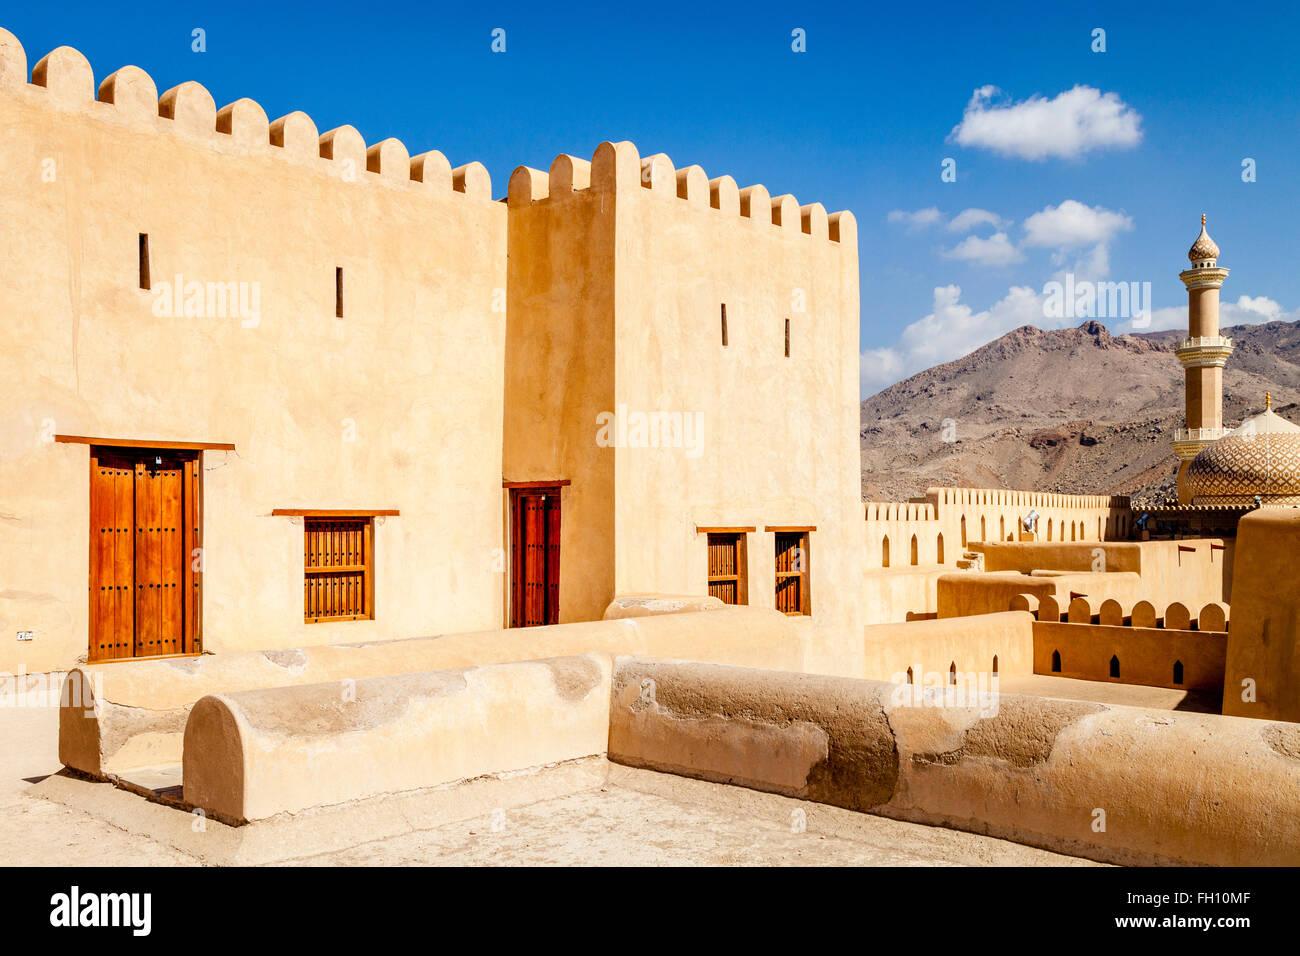 Le Fort de Nizwa Nizwa, Ad Dakhiliyah, région, Oman Photo Stock